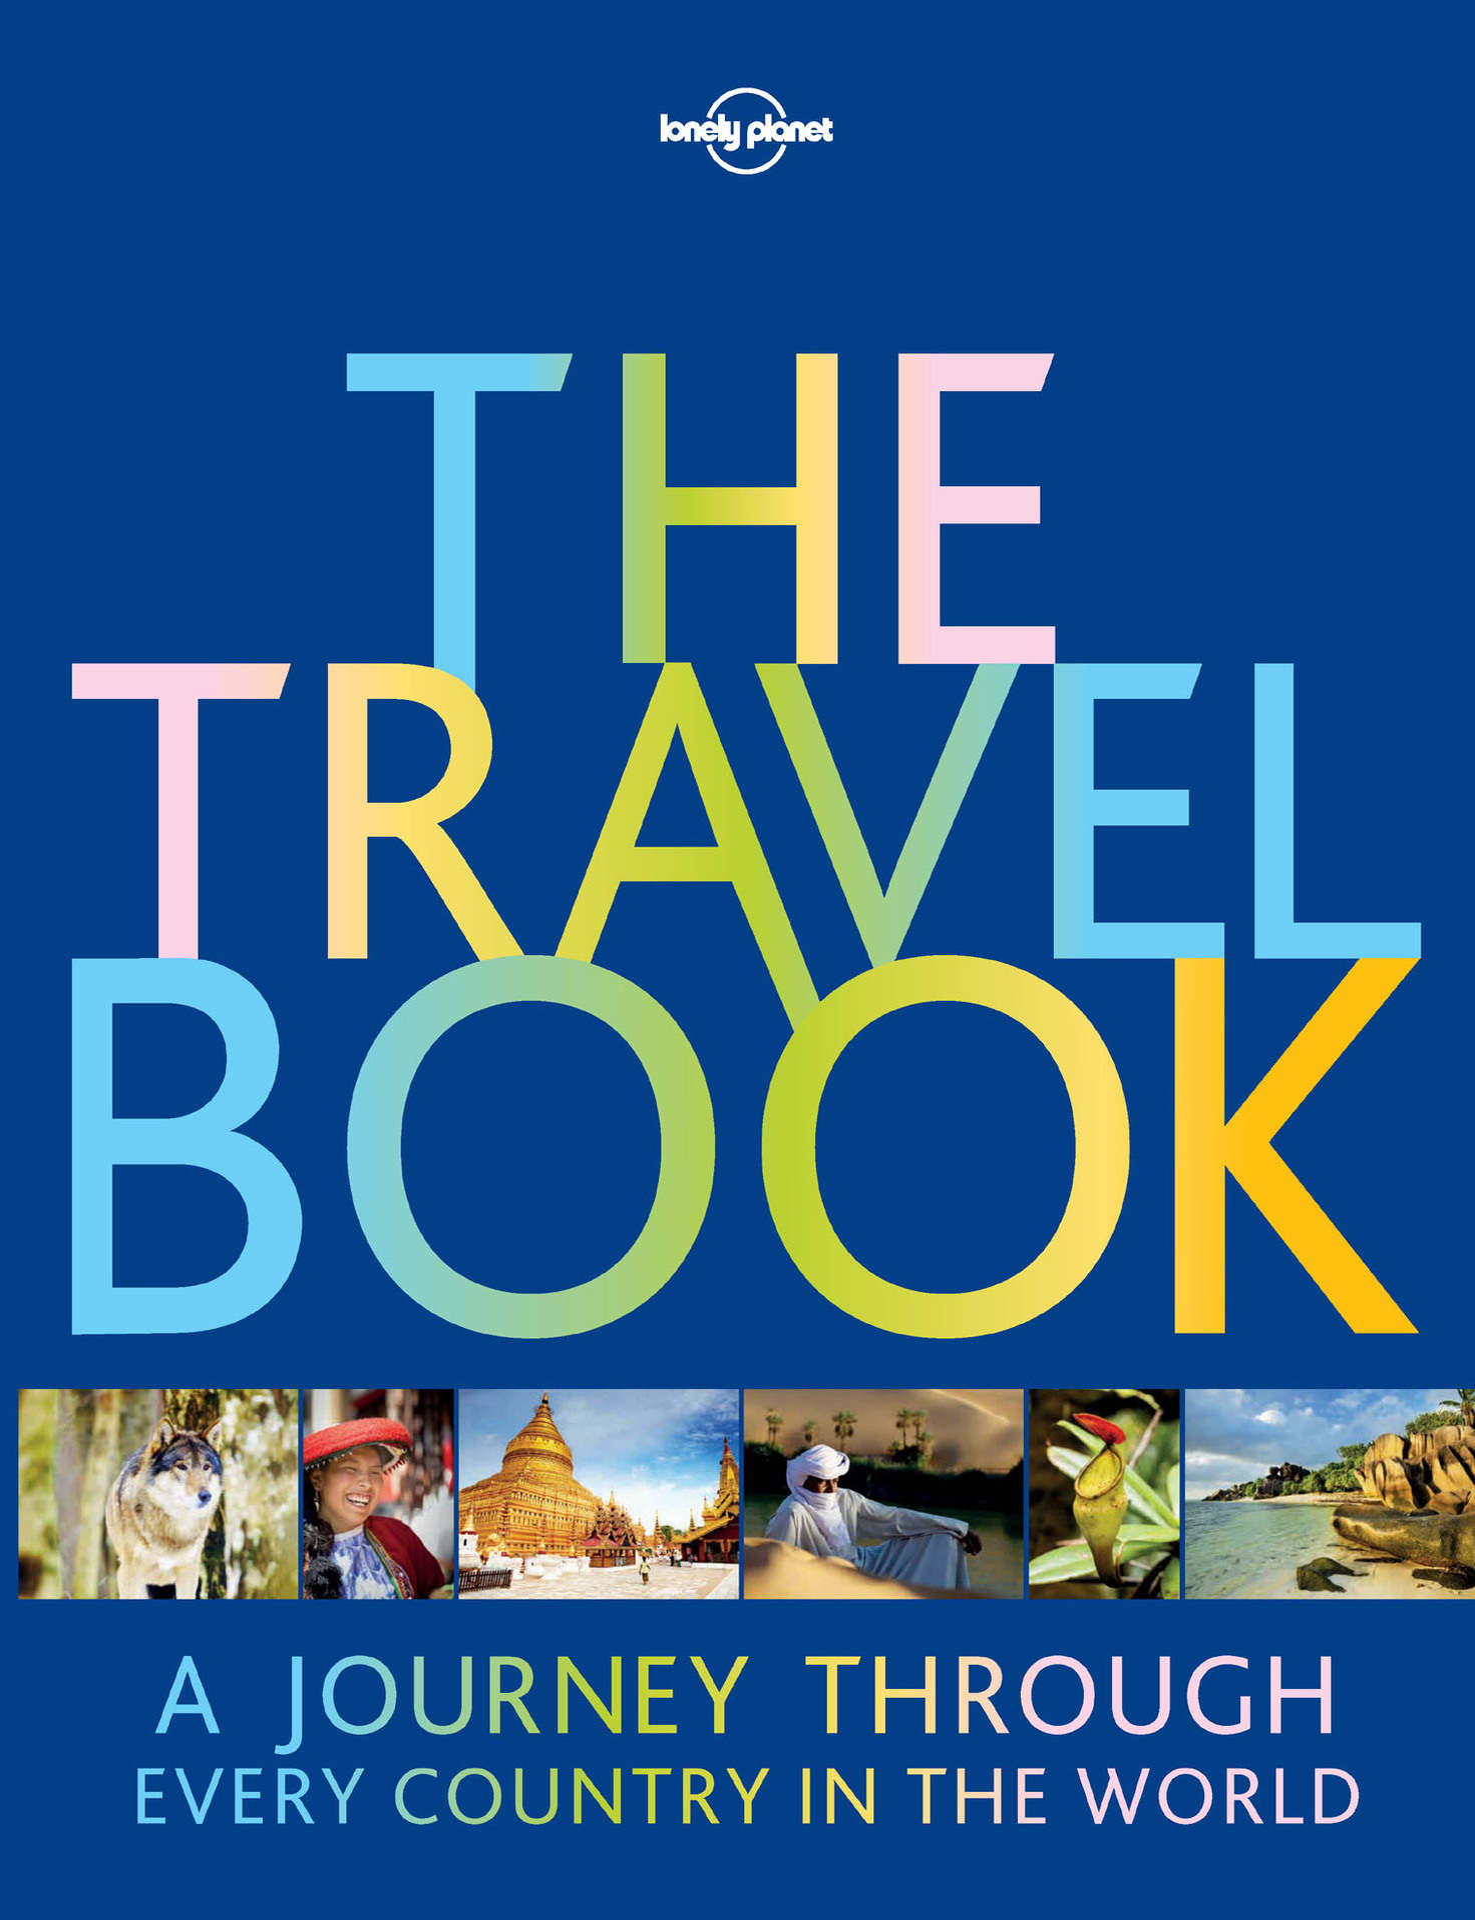 LMG Book Club: The Travel Book